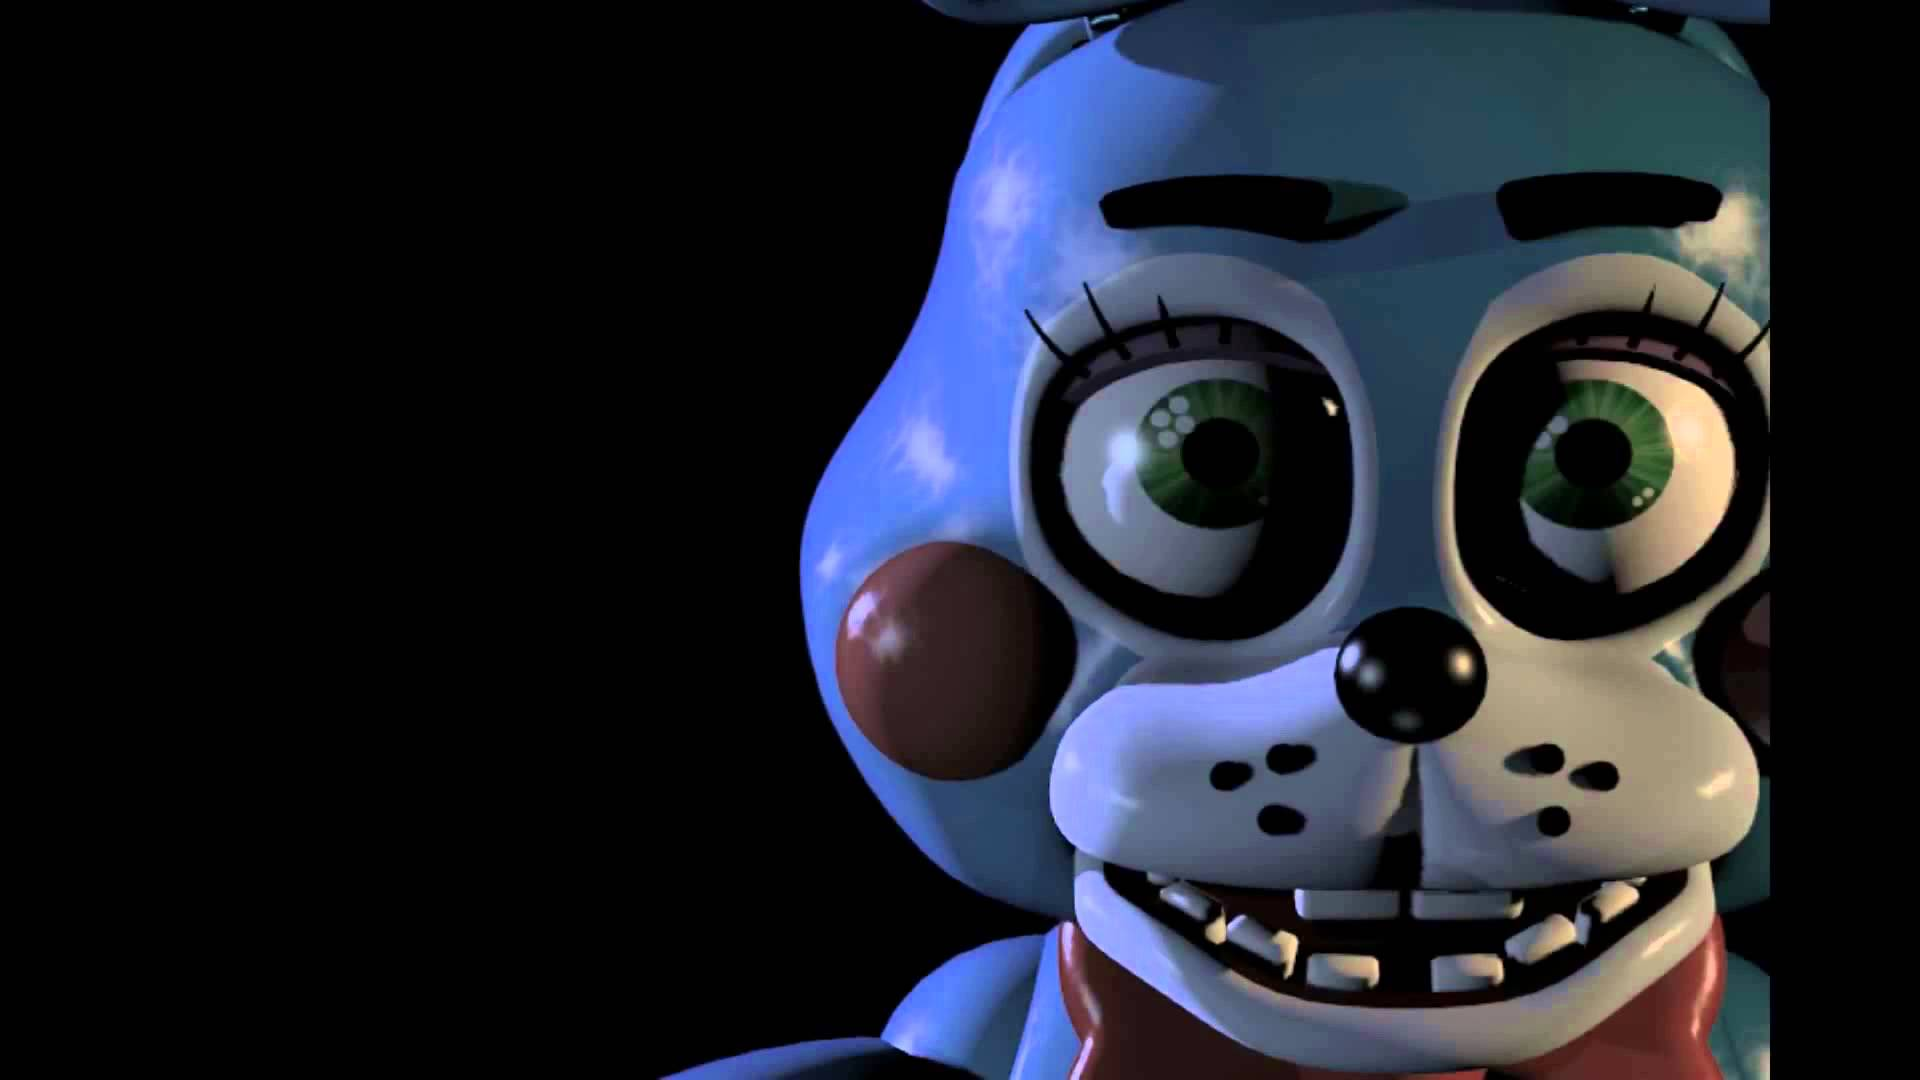 Five Nights at Freddys 2 Online Games Tus juegos online 1920x1080